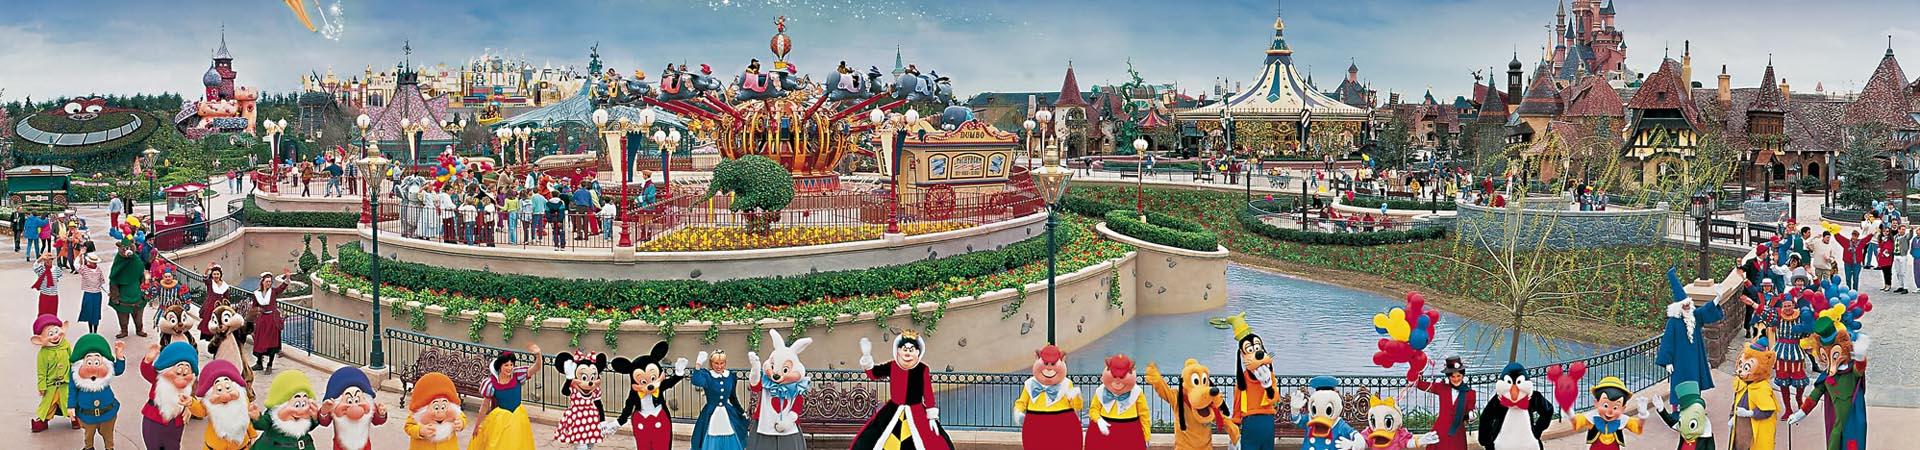 Disney Turismo 2015